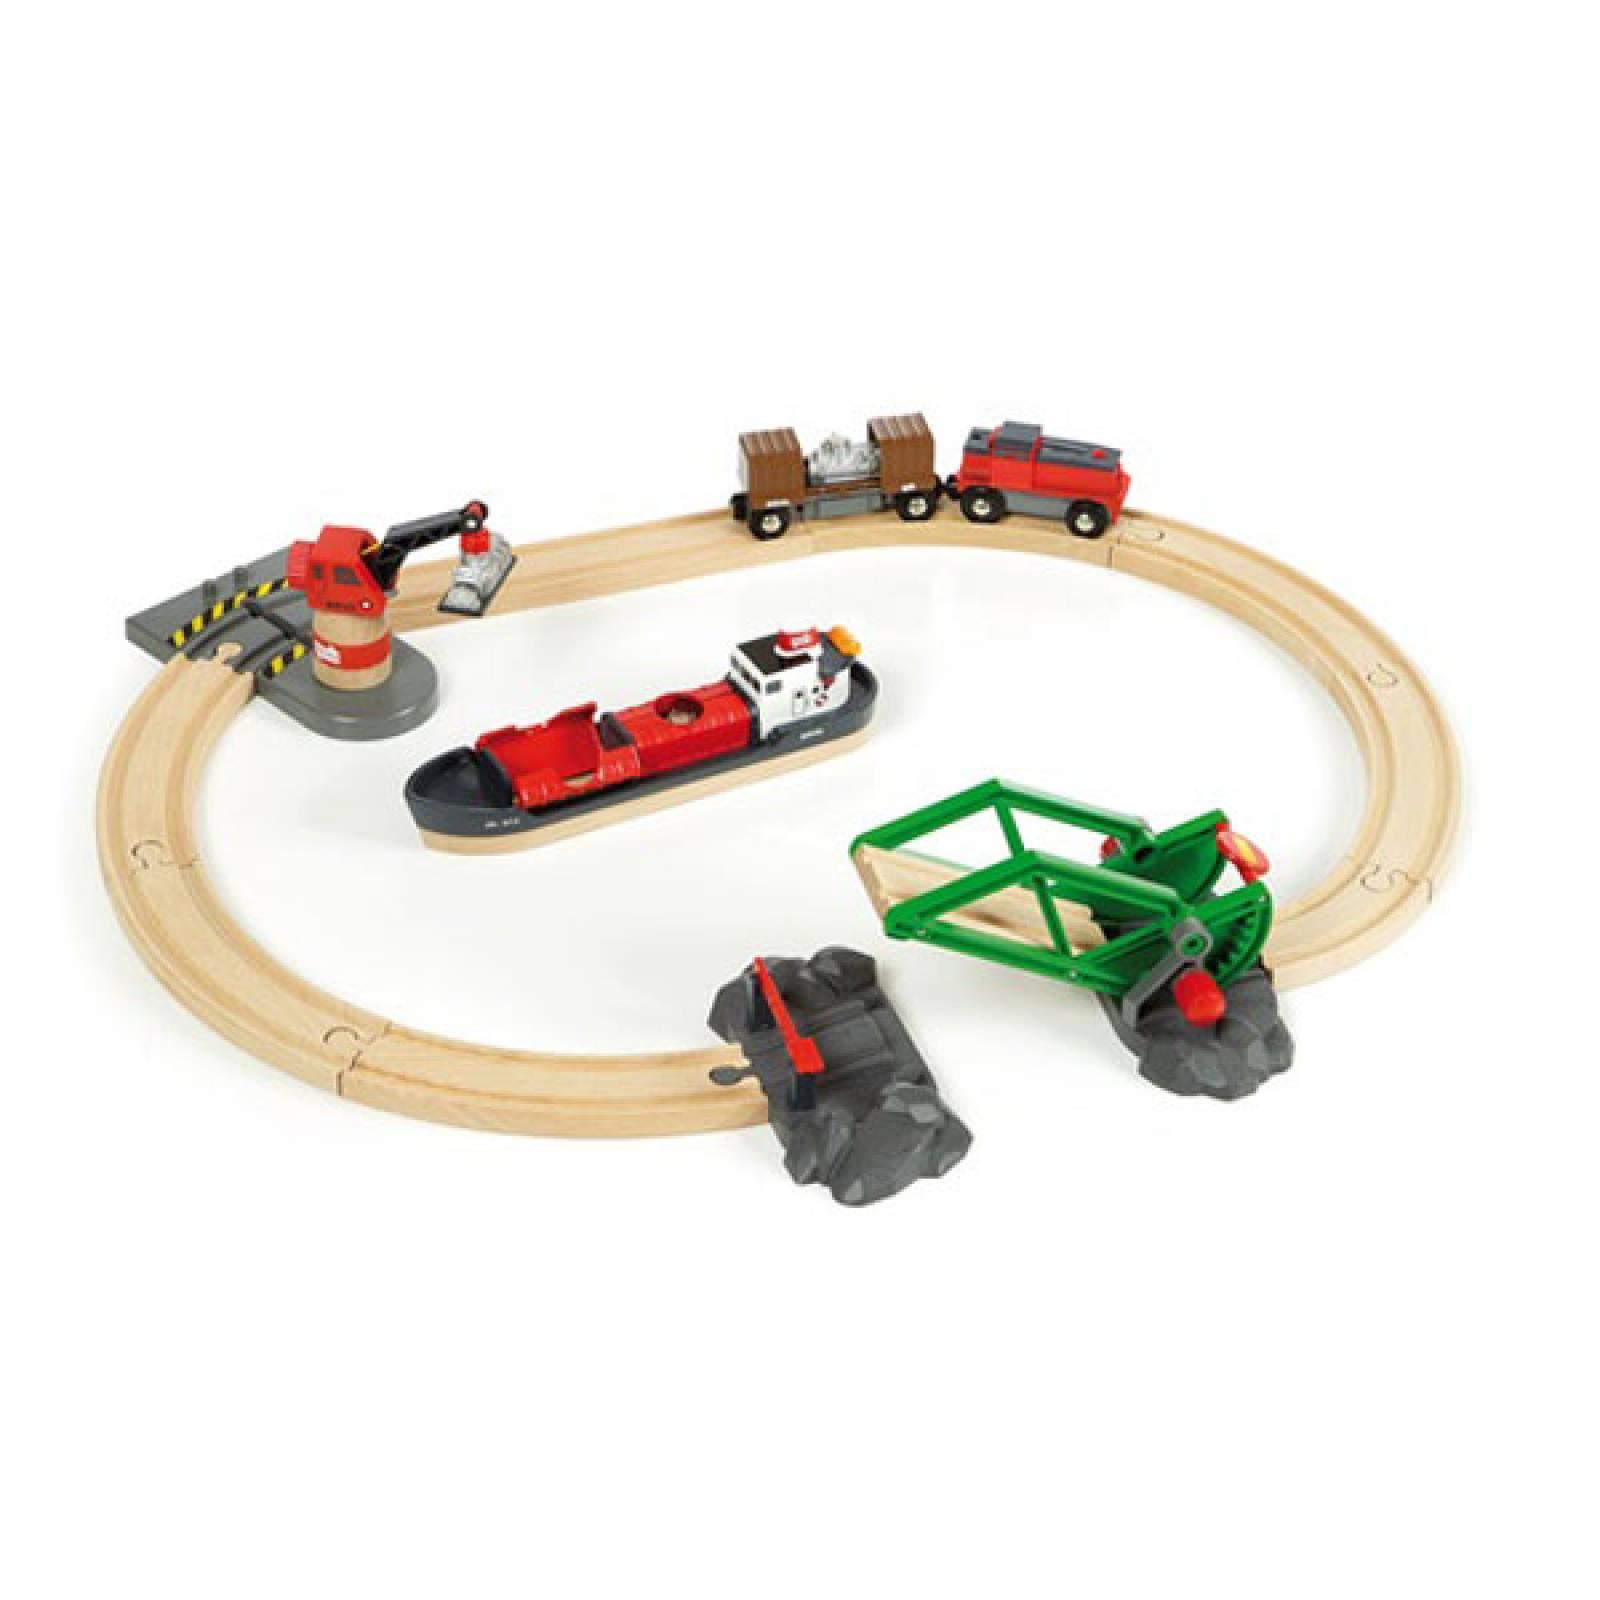 Cargo Harbour Set BRIO® Wooden Railway Age 3+ thumbnails